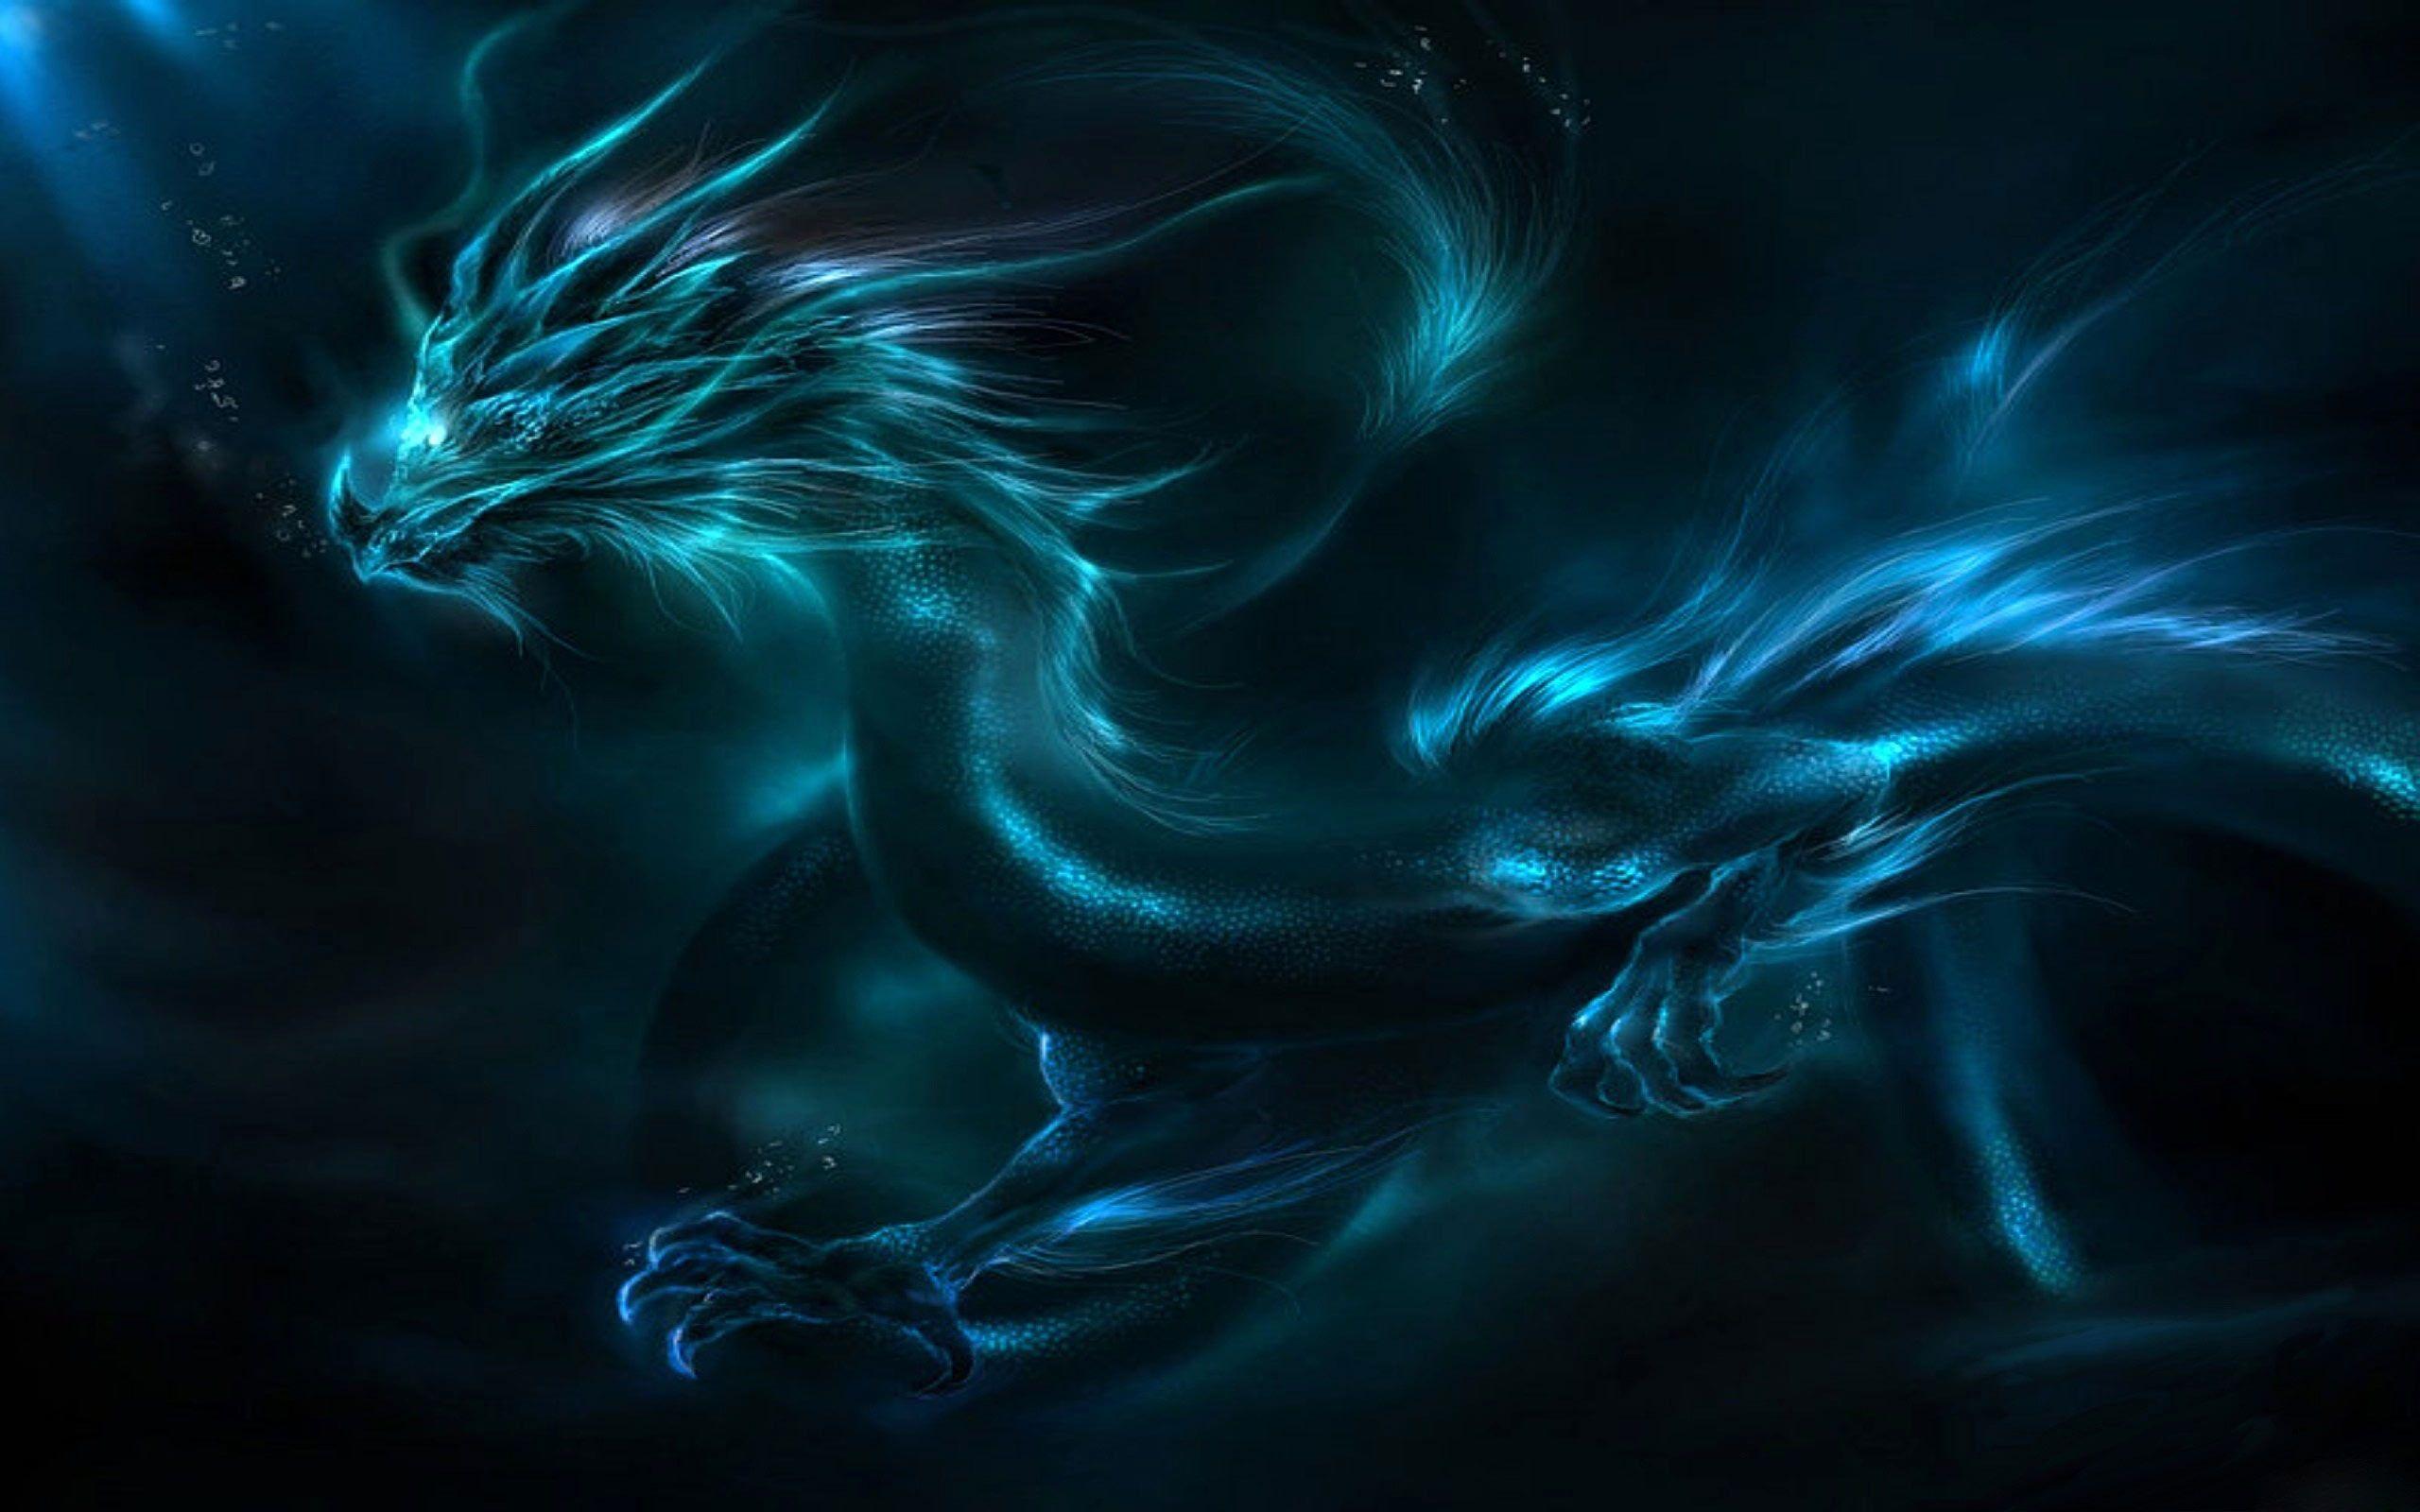 Water Dragon Wallpapers Desktop